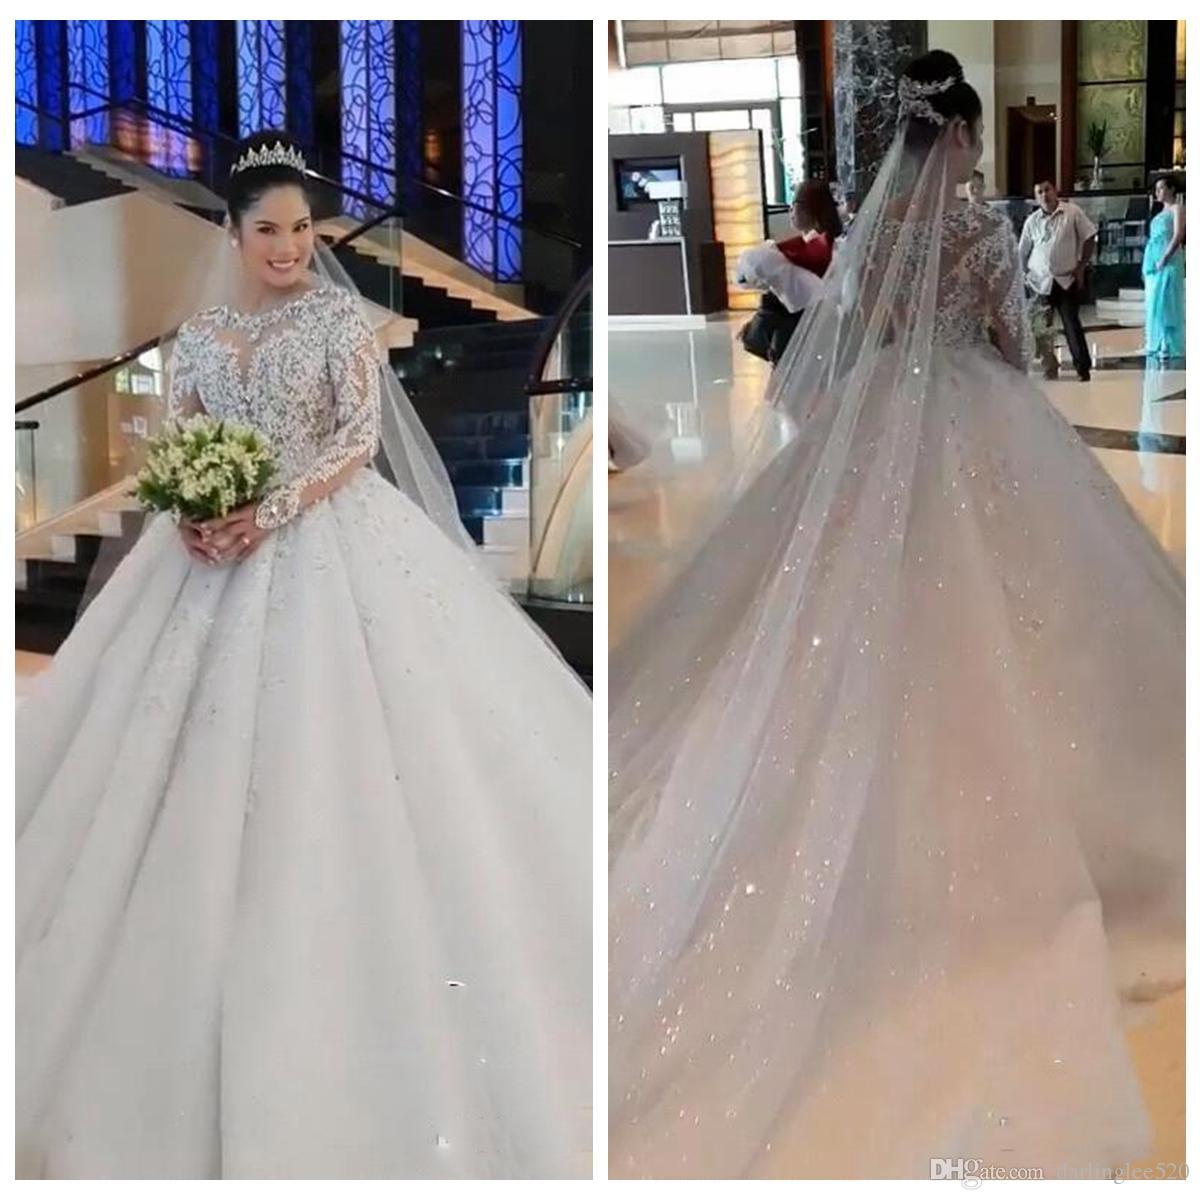 5d03d78aebaa7 Vestido De Novia 2019 Plus Size Ball Gown Wedding Dresses Crew Neck Illusion  Long Sleeve Satin Beads Sweep Train Vintage Luxury Bridal Gowns Corset For  ...